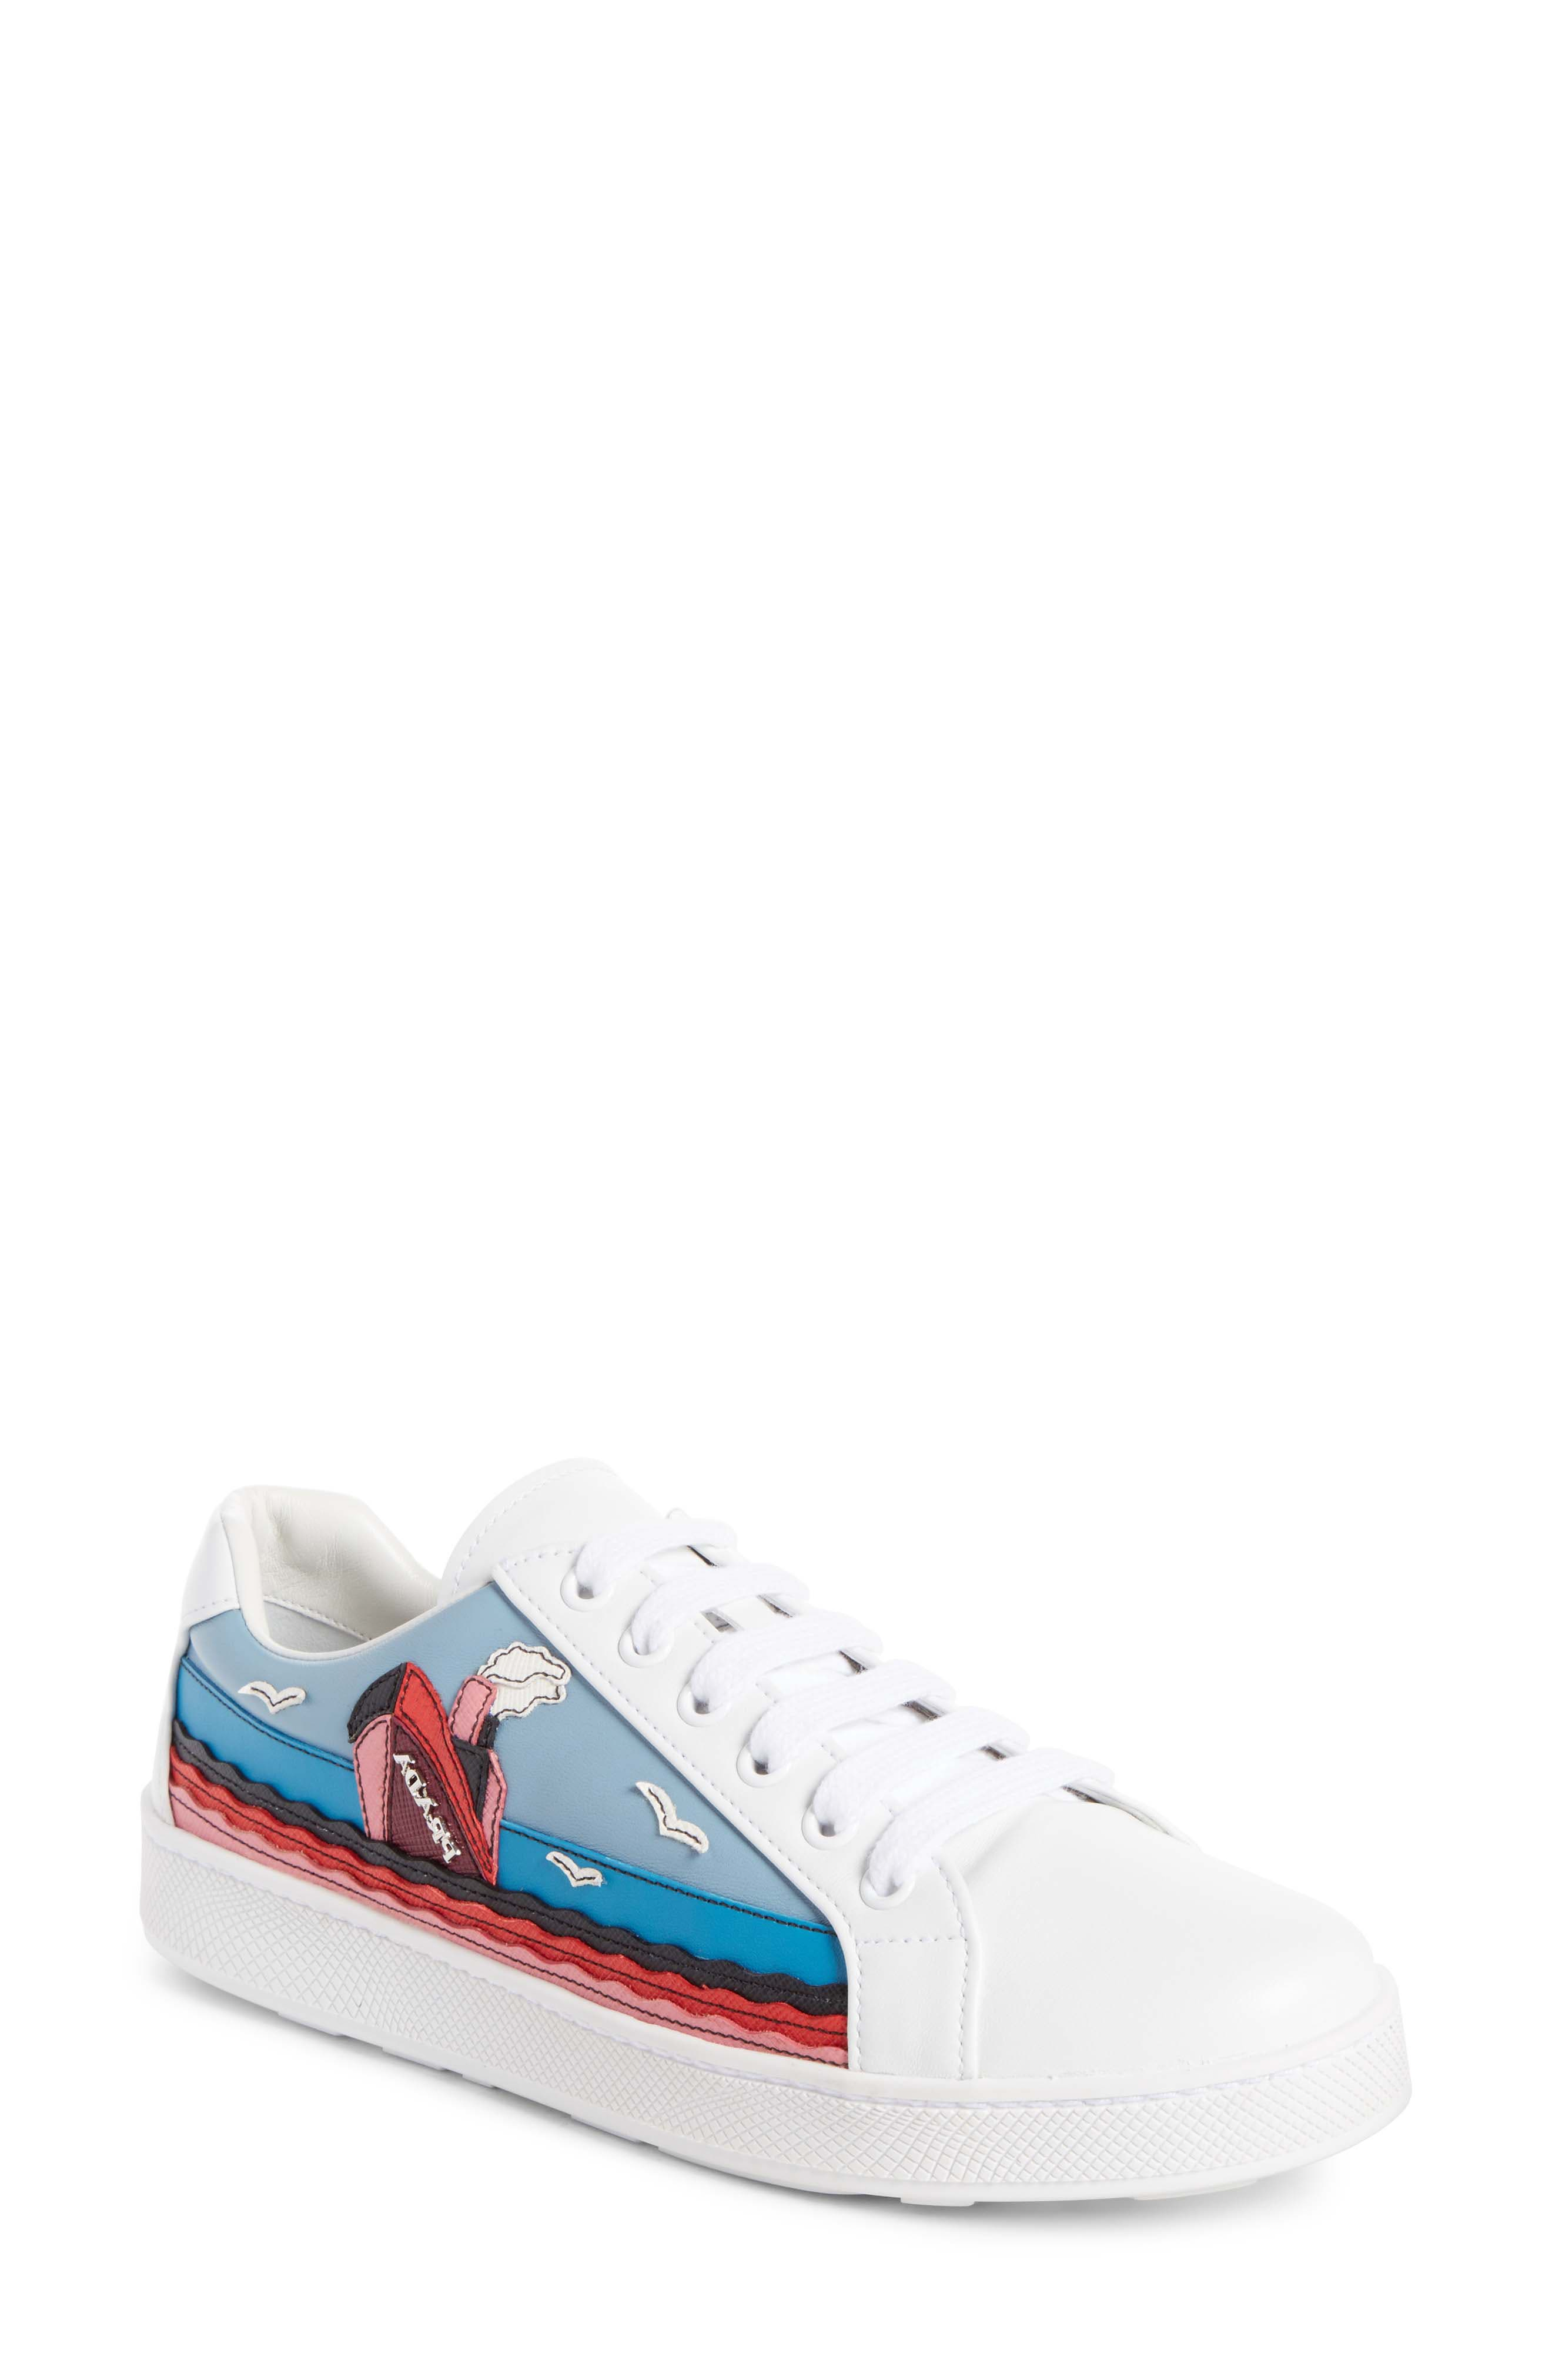 Boat Platform Lace-Up Sneaker,                         Main,                         color, White